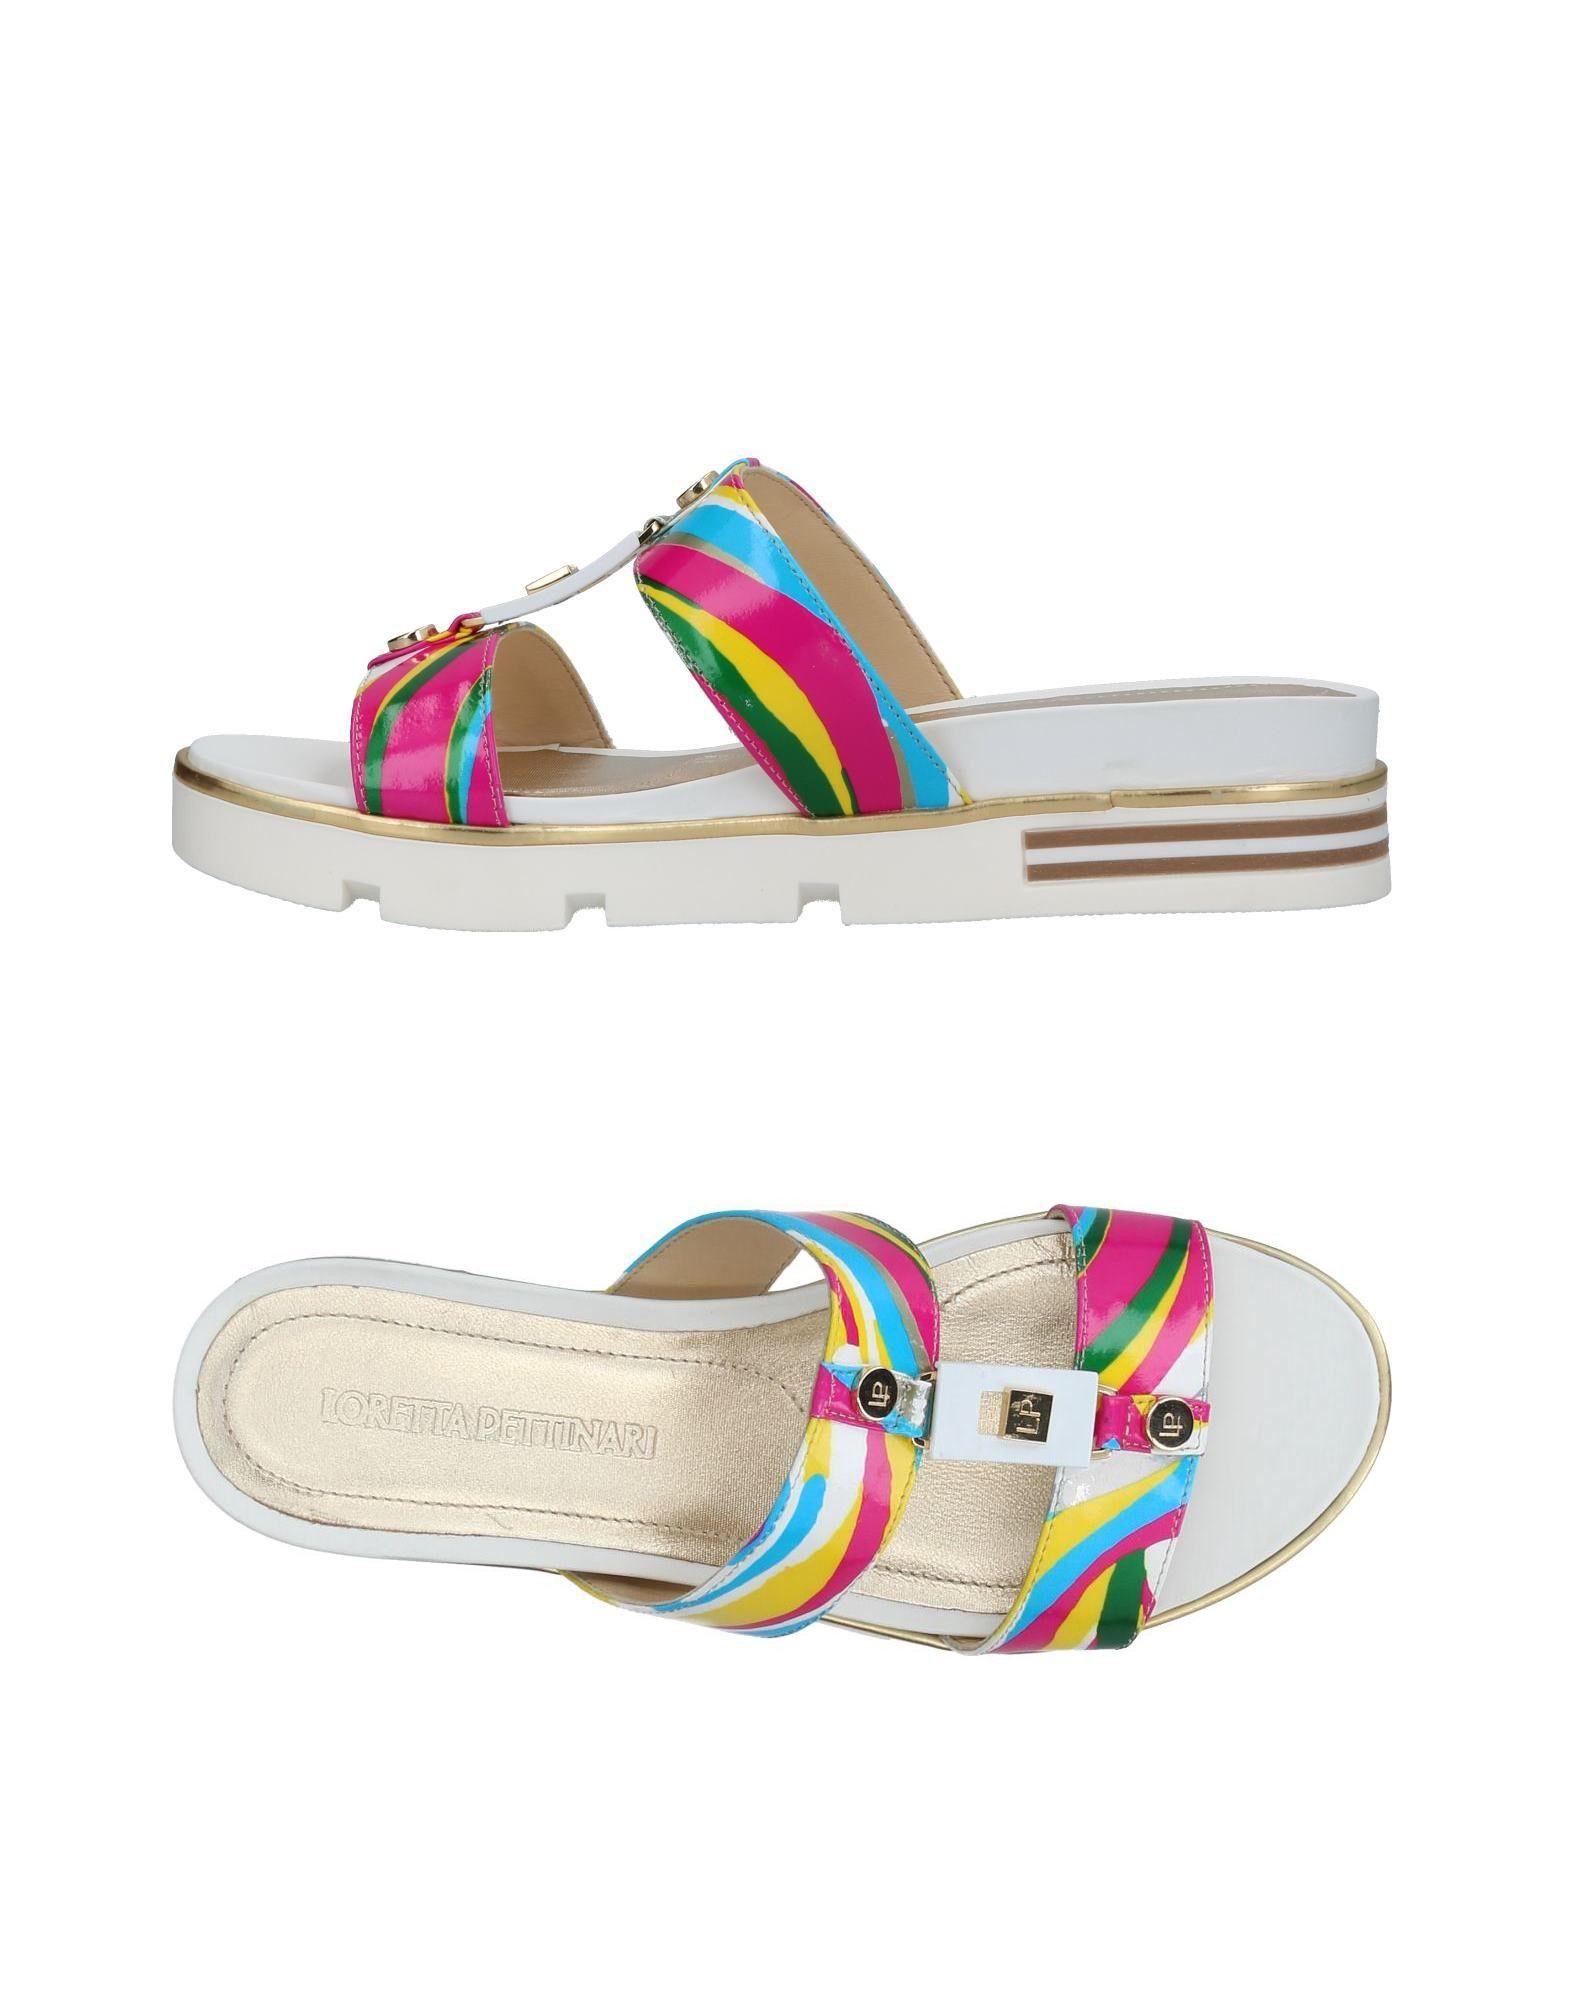 Loretta Pettinari Sandalen Damen  11389846NF Gute Qualität beliebte Schuhe